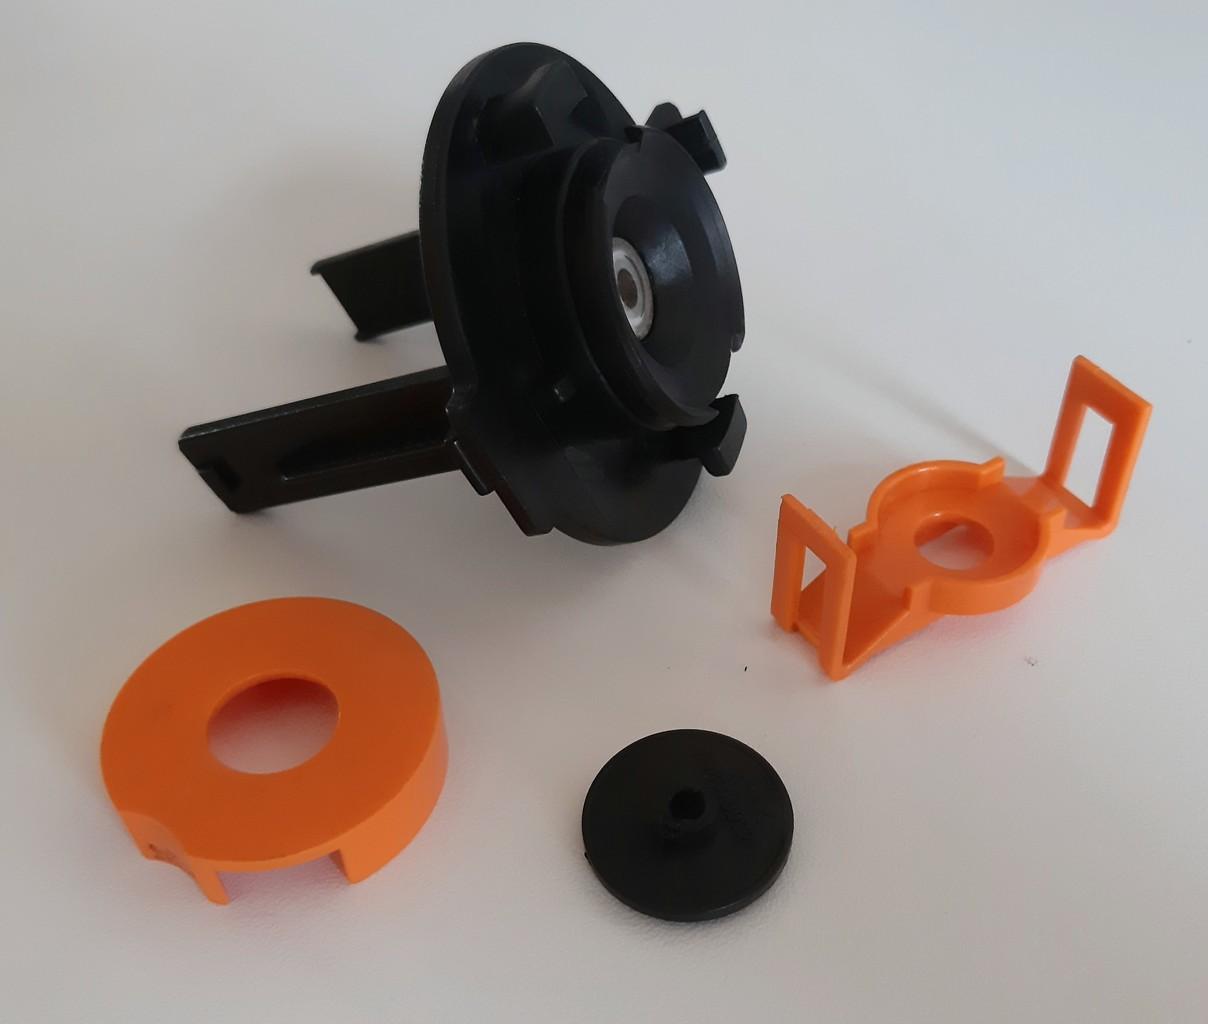 Корпус мотора миксера, 4 детали